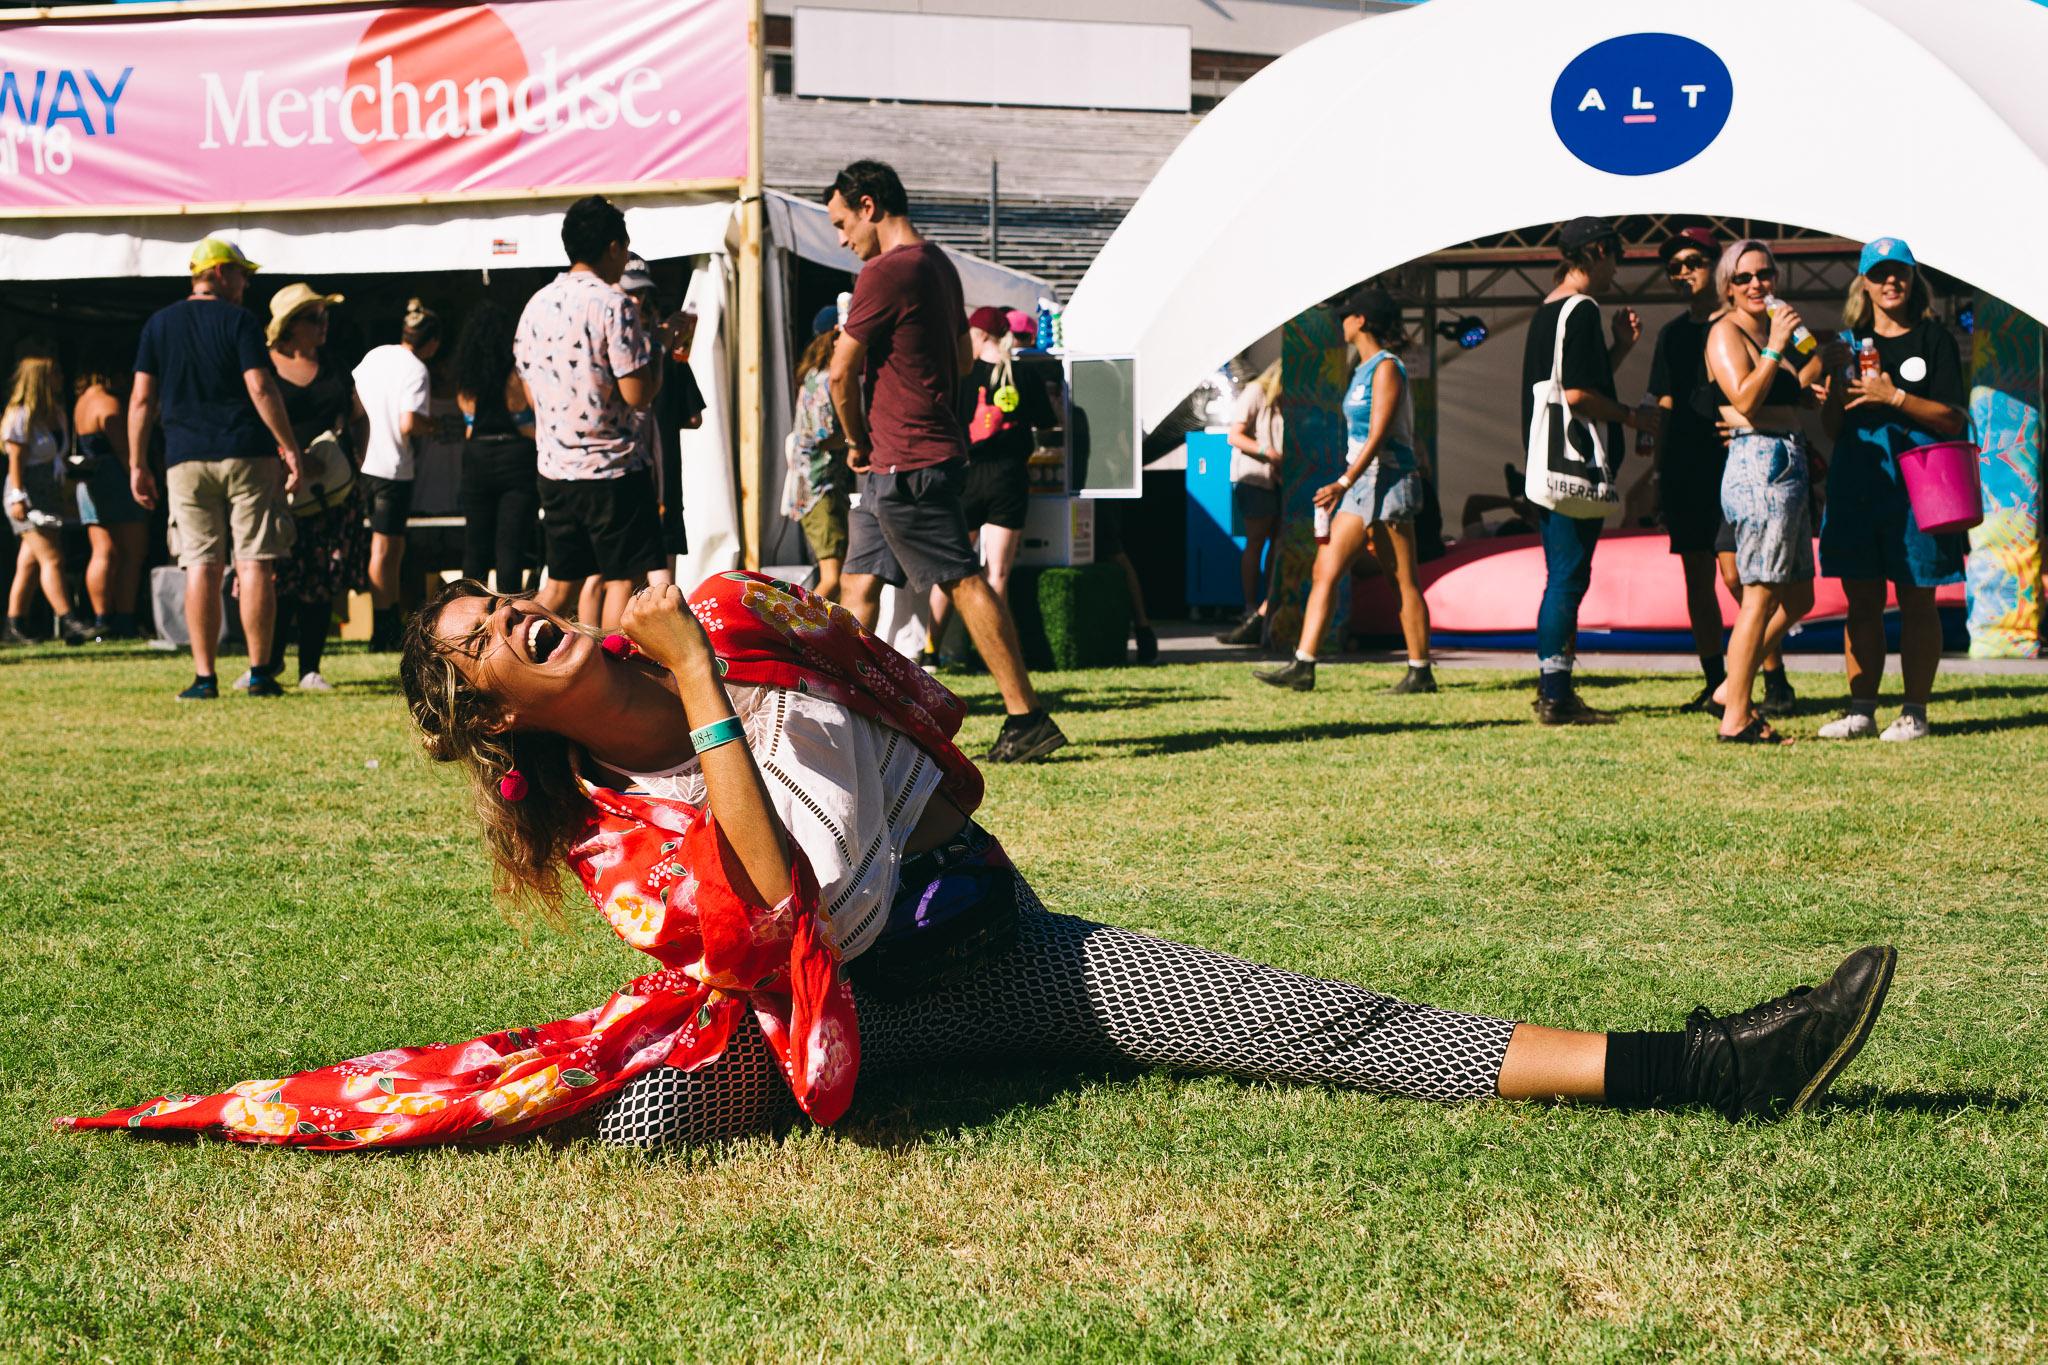 Atmosphere_Laneway-Festival-Brisbane-2018_Credit-Bianca-Holderness-81.jpg